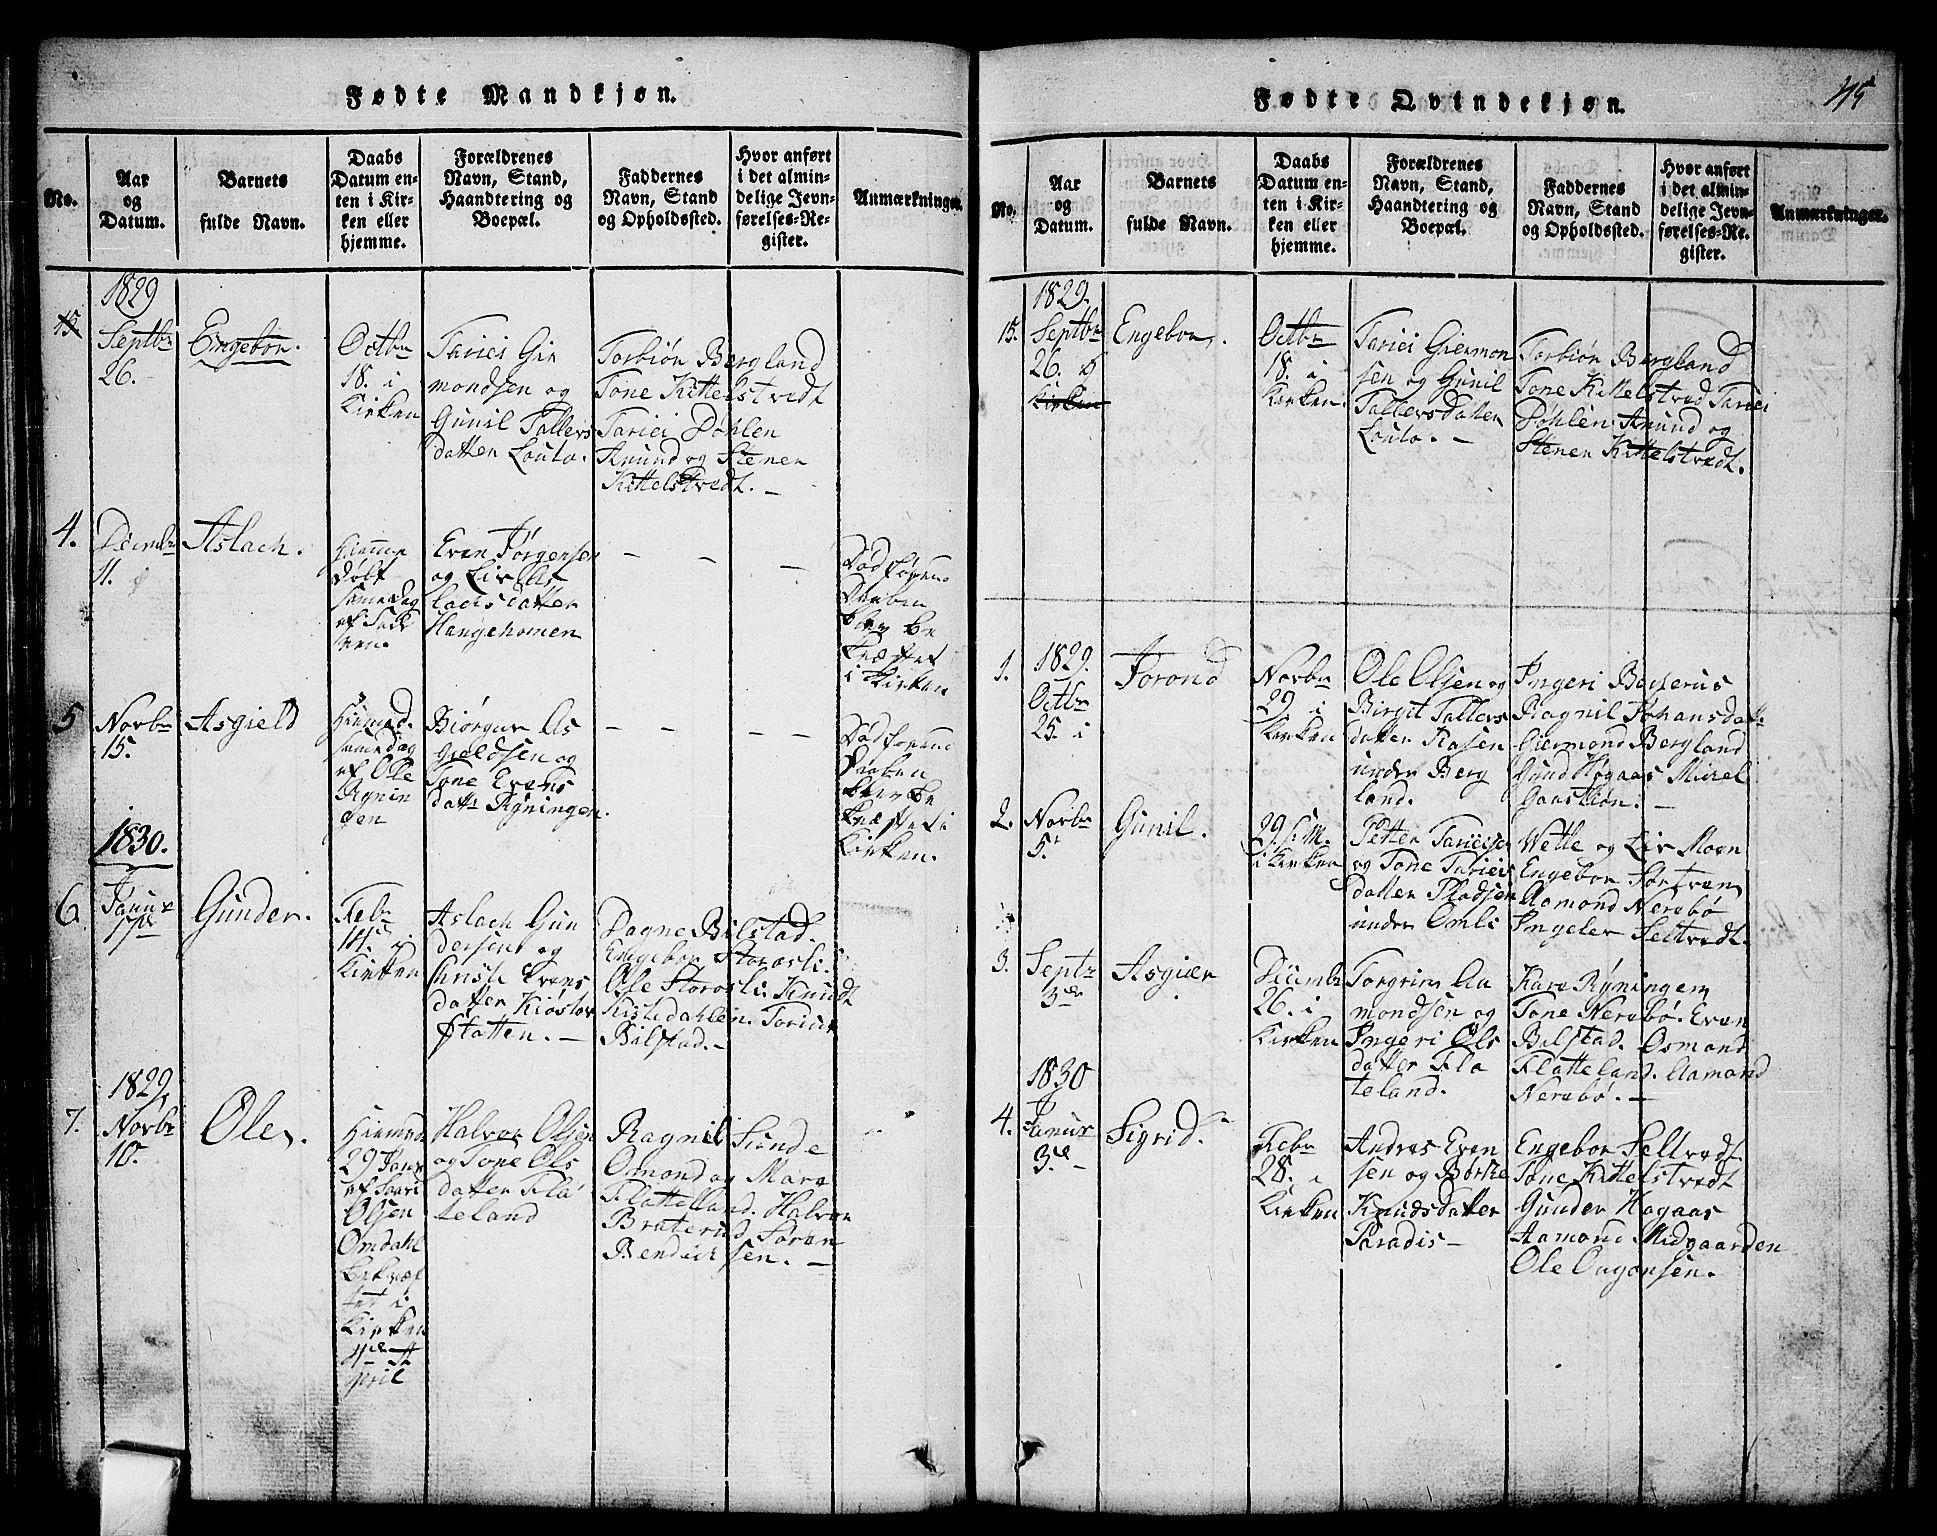 SAKO, Mo kirkebøker, G/Gb/L0001: Klokkerbok nr. II 1, 1814-1843, s. 45